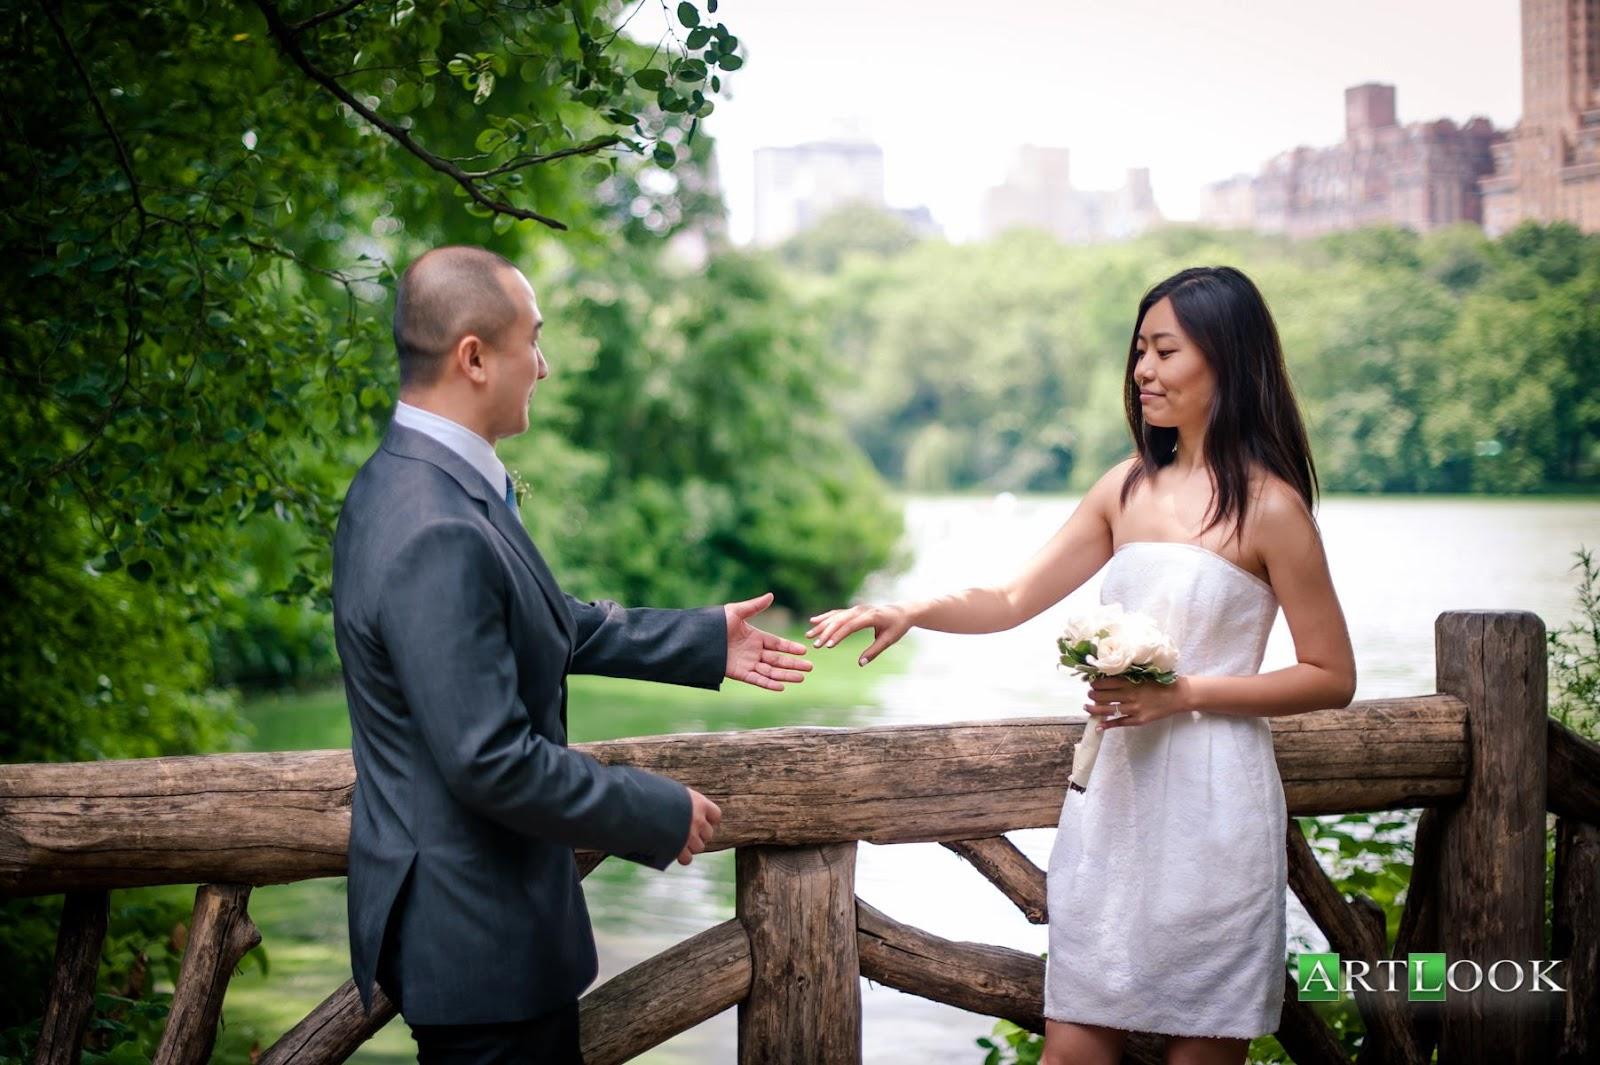 Cheap wedding photographer miami AAFT Film Academy Delhi Film Studies Media School in